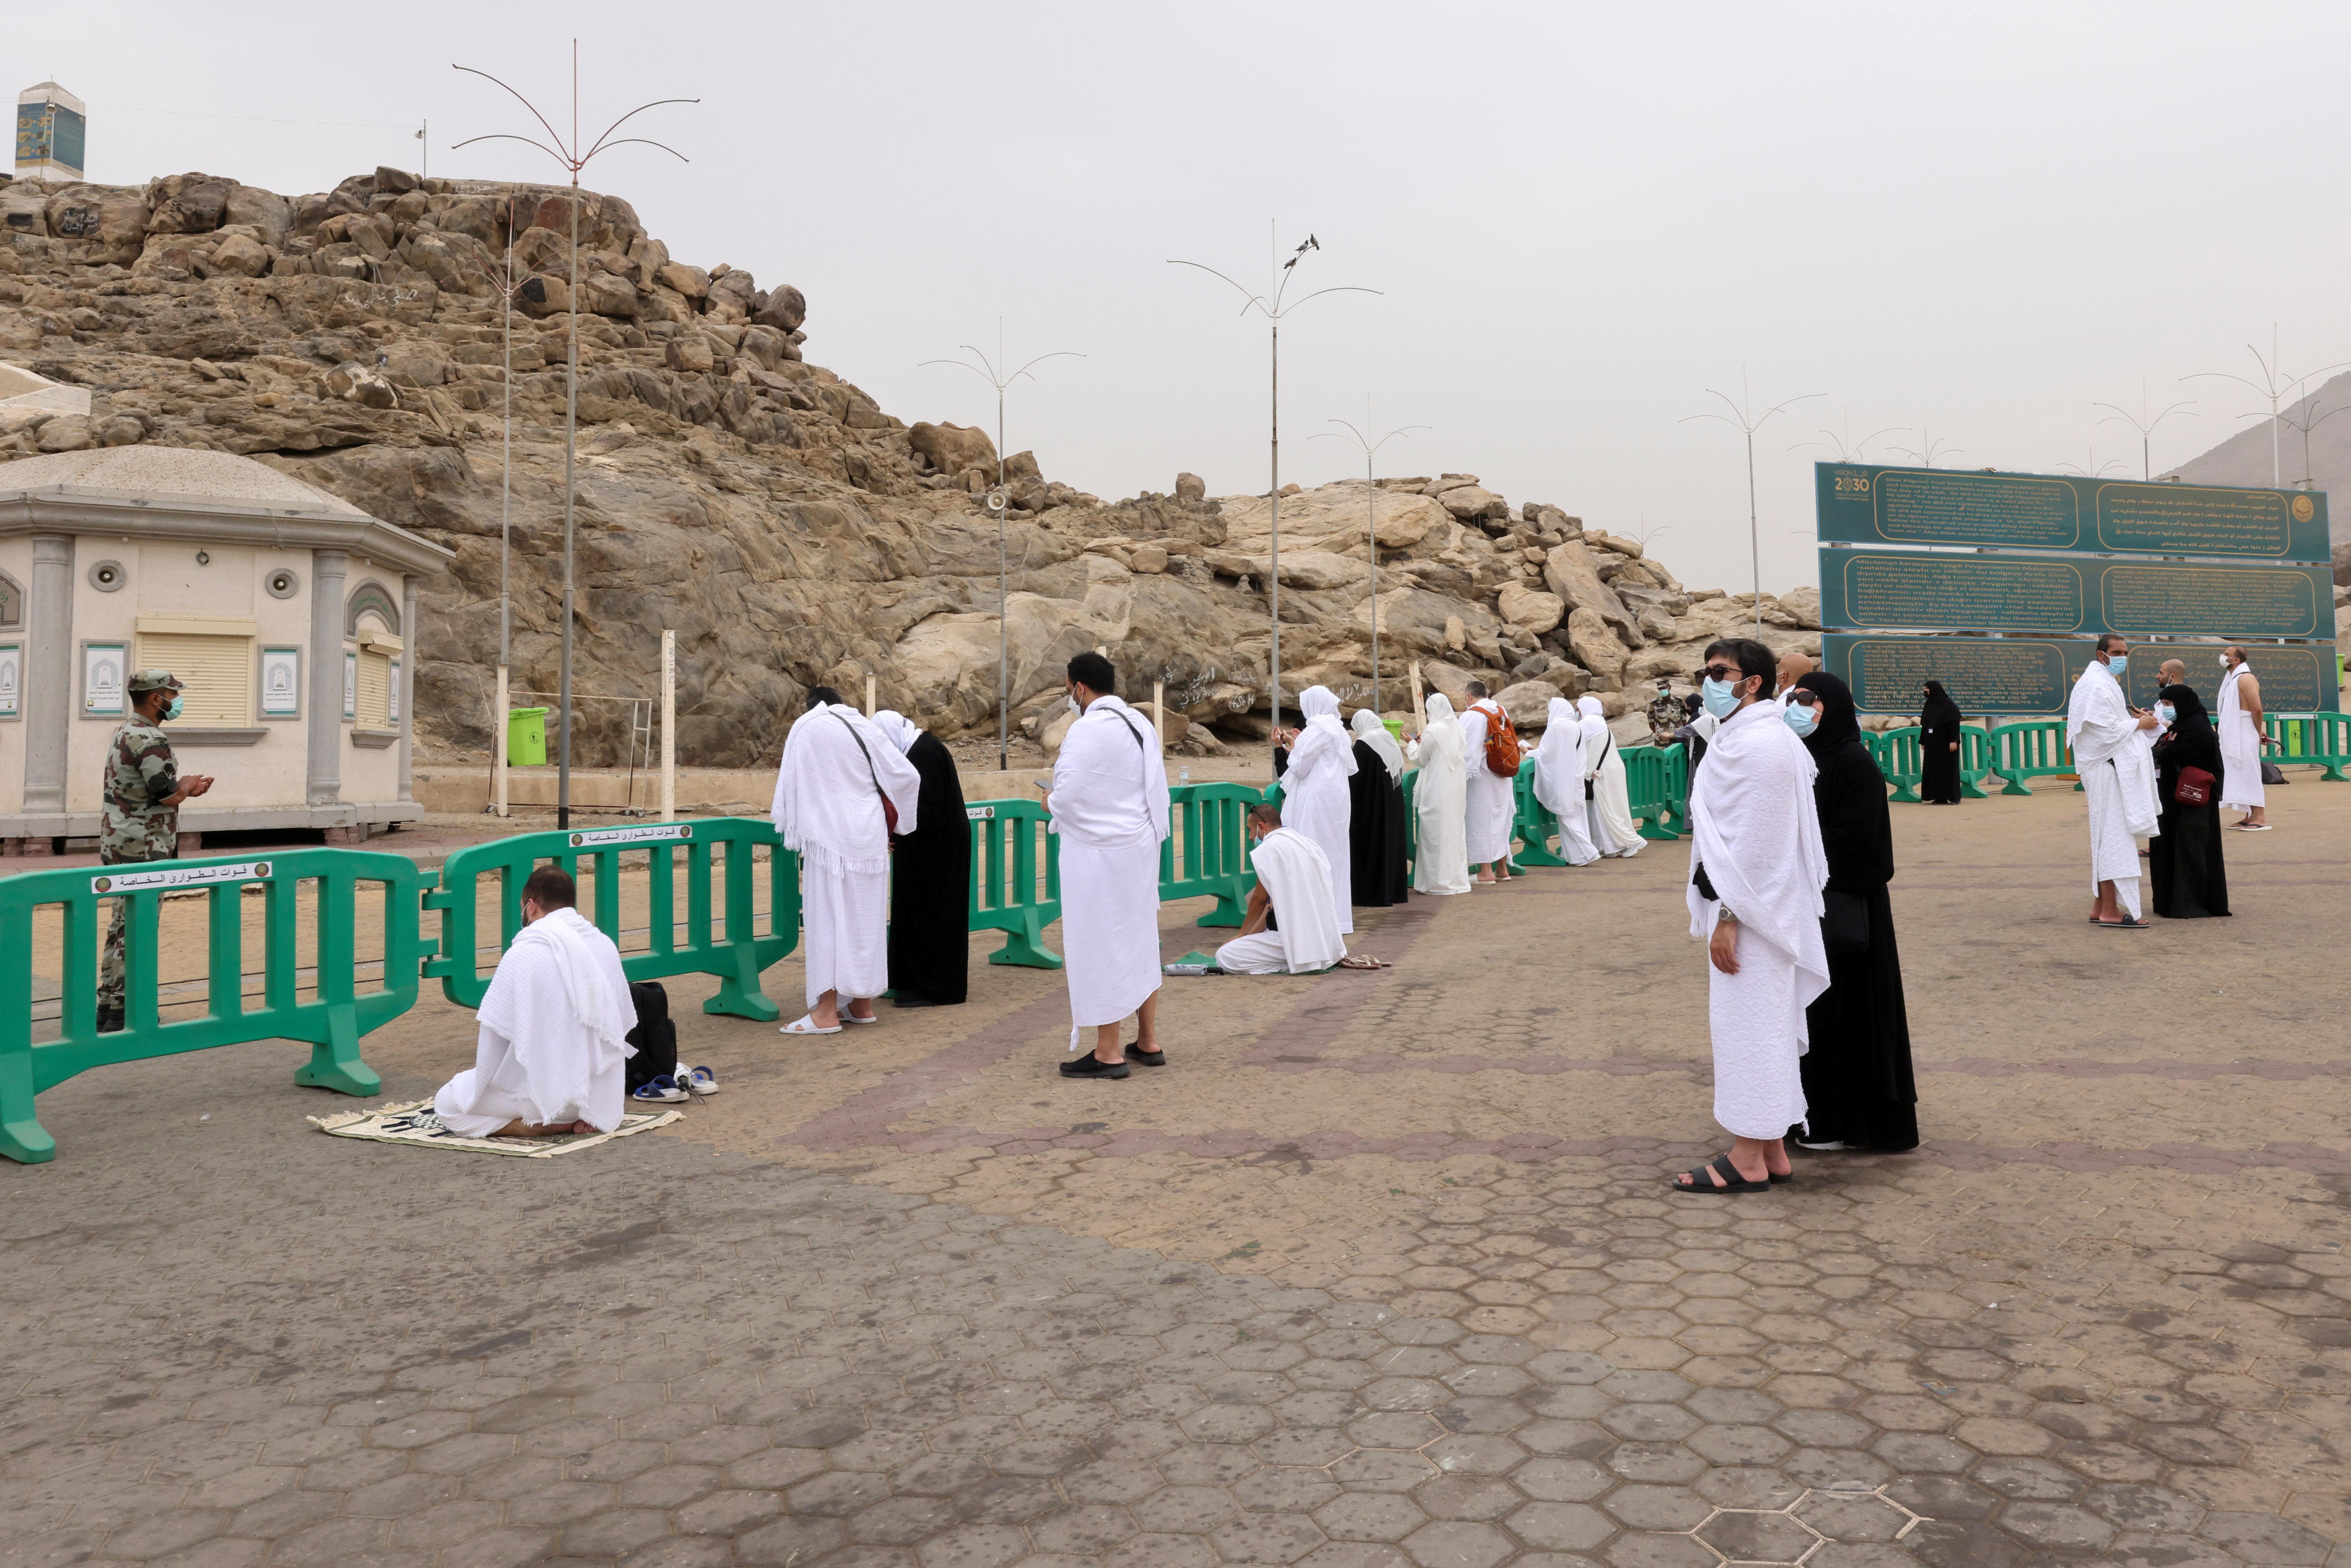 Muslim pilgrims gather at the plain of Arafat during the annual Haj pilgrimage, outside the holy city of Mecca, Saudi Arabia July 19, 2021. REUTERS/Ahmed Yosri